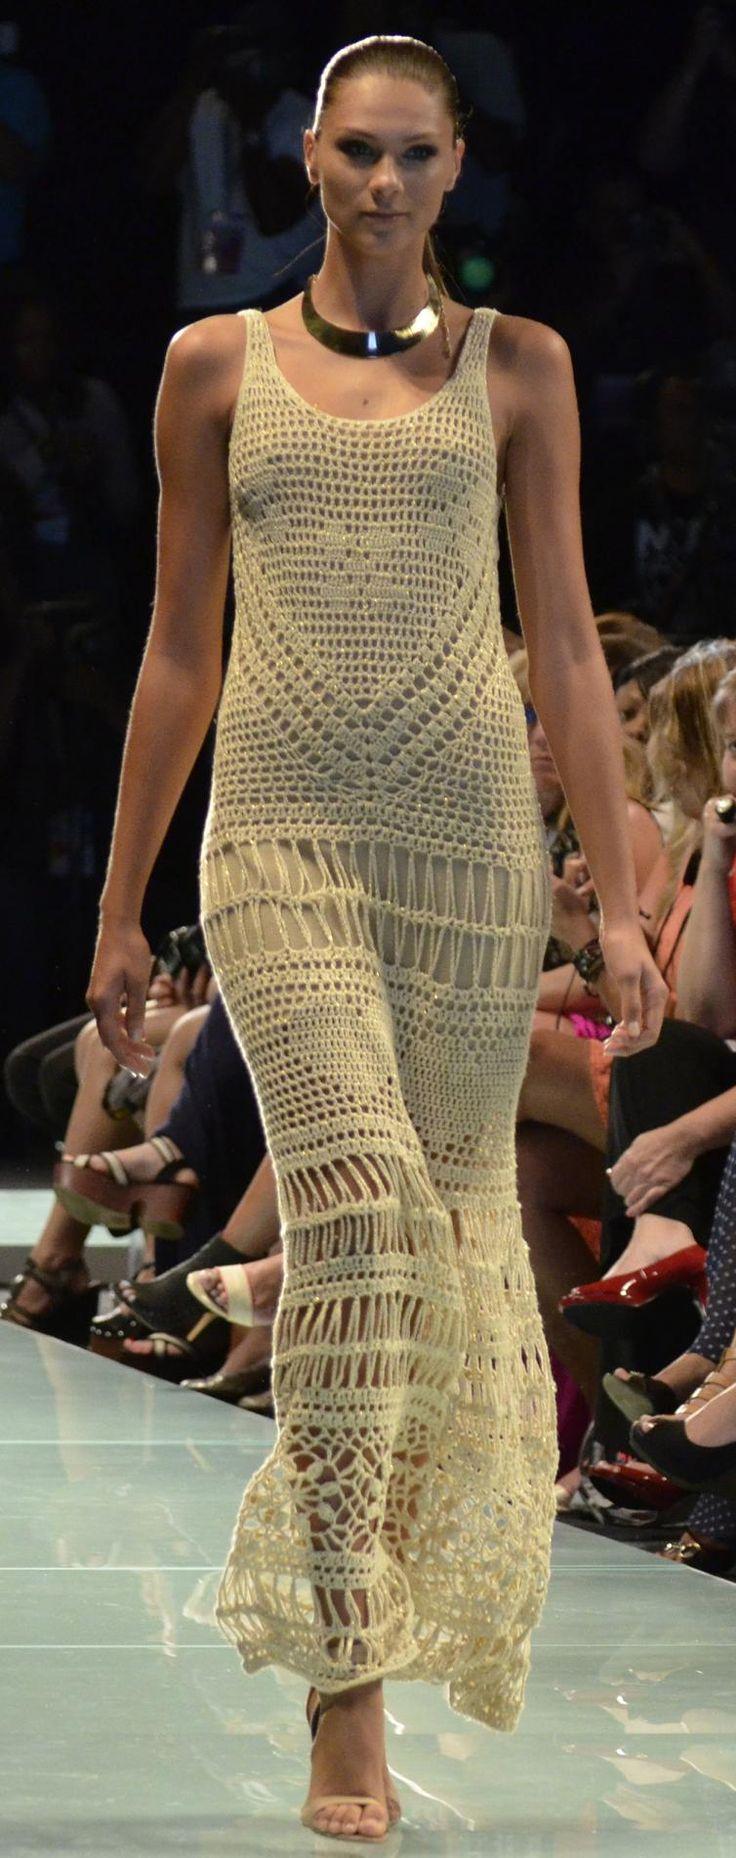 crochet dress by Agostina Bianchi